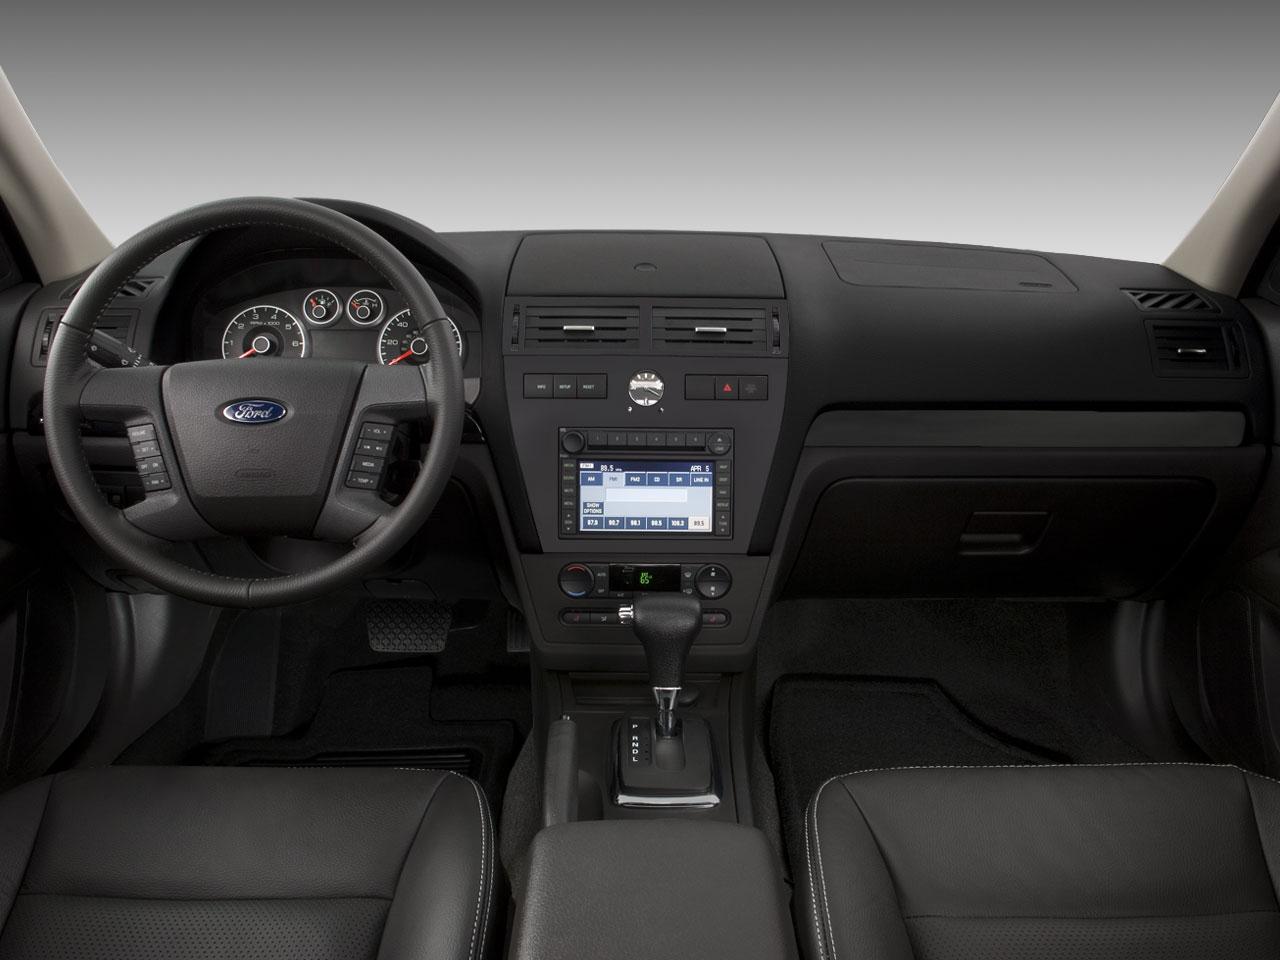 2009 ford fusion sel awd ford midsize sedan review automobile magazine. Black Bedroom Furniture Sets. Home Design Ideas